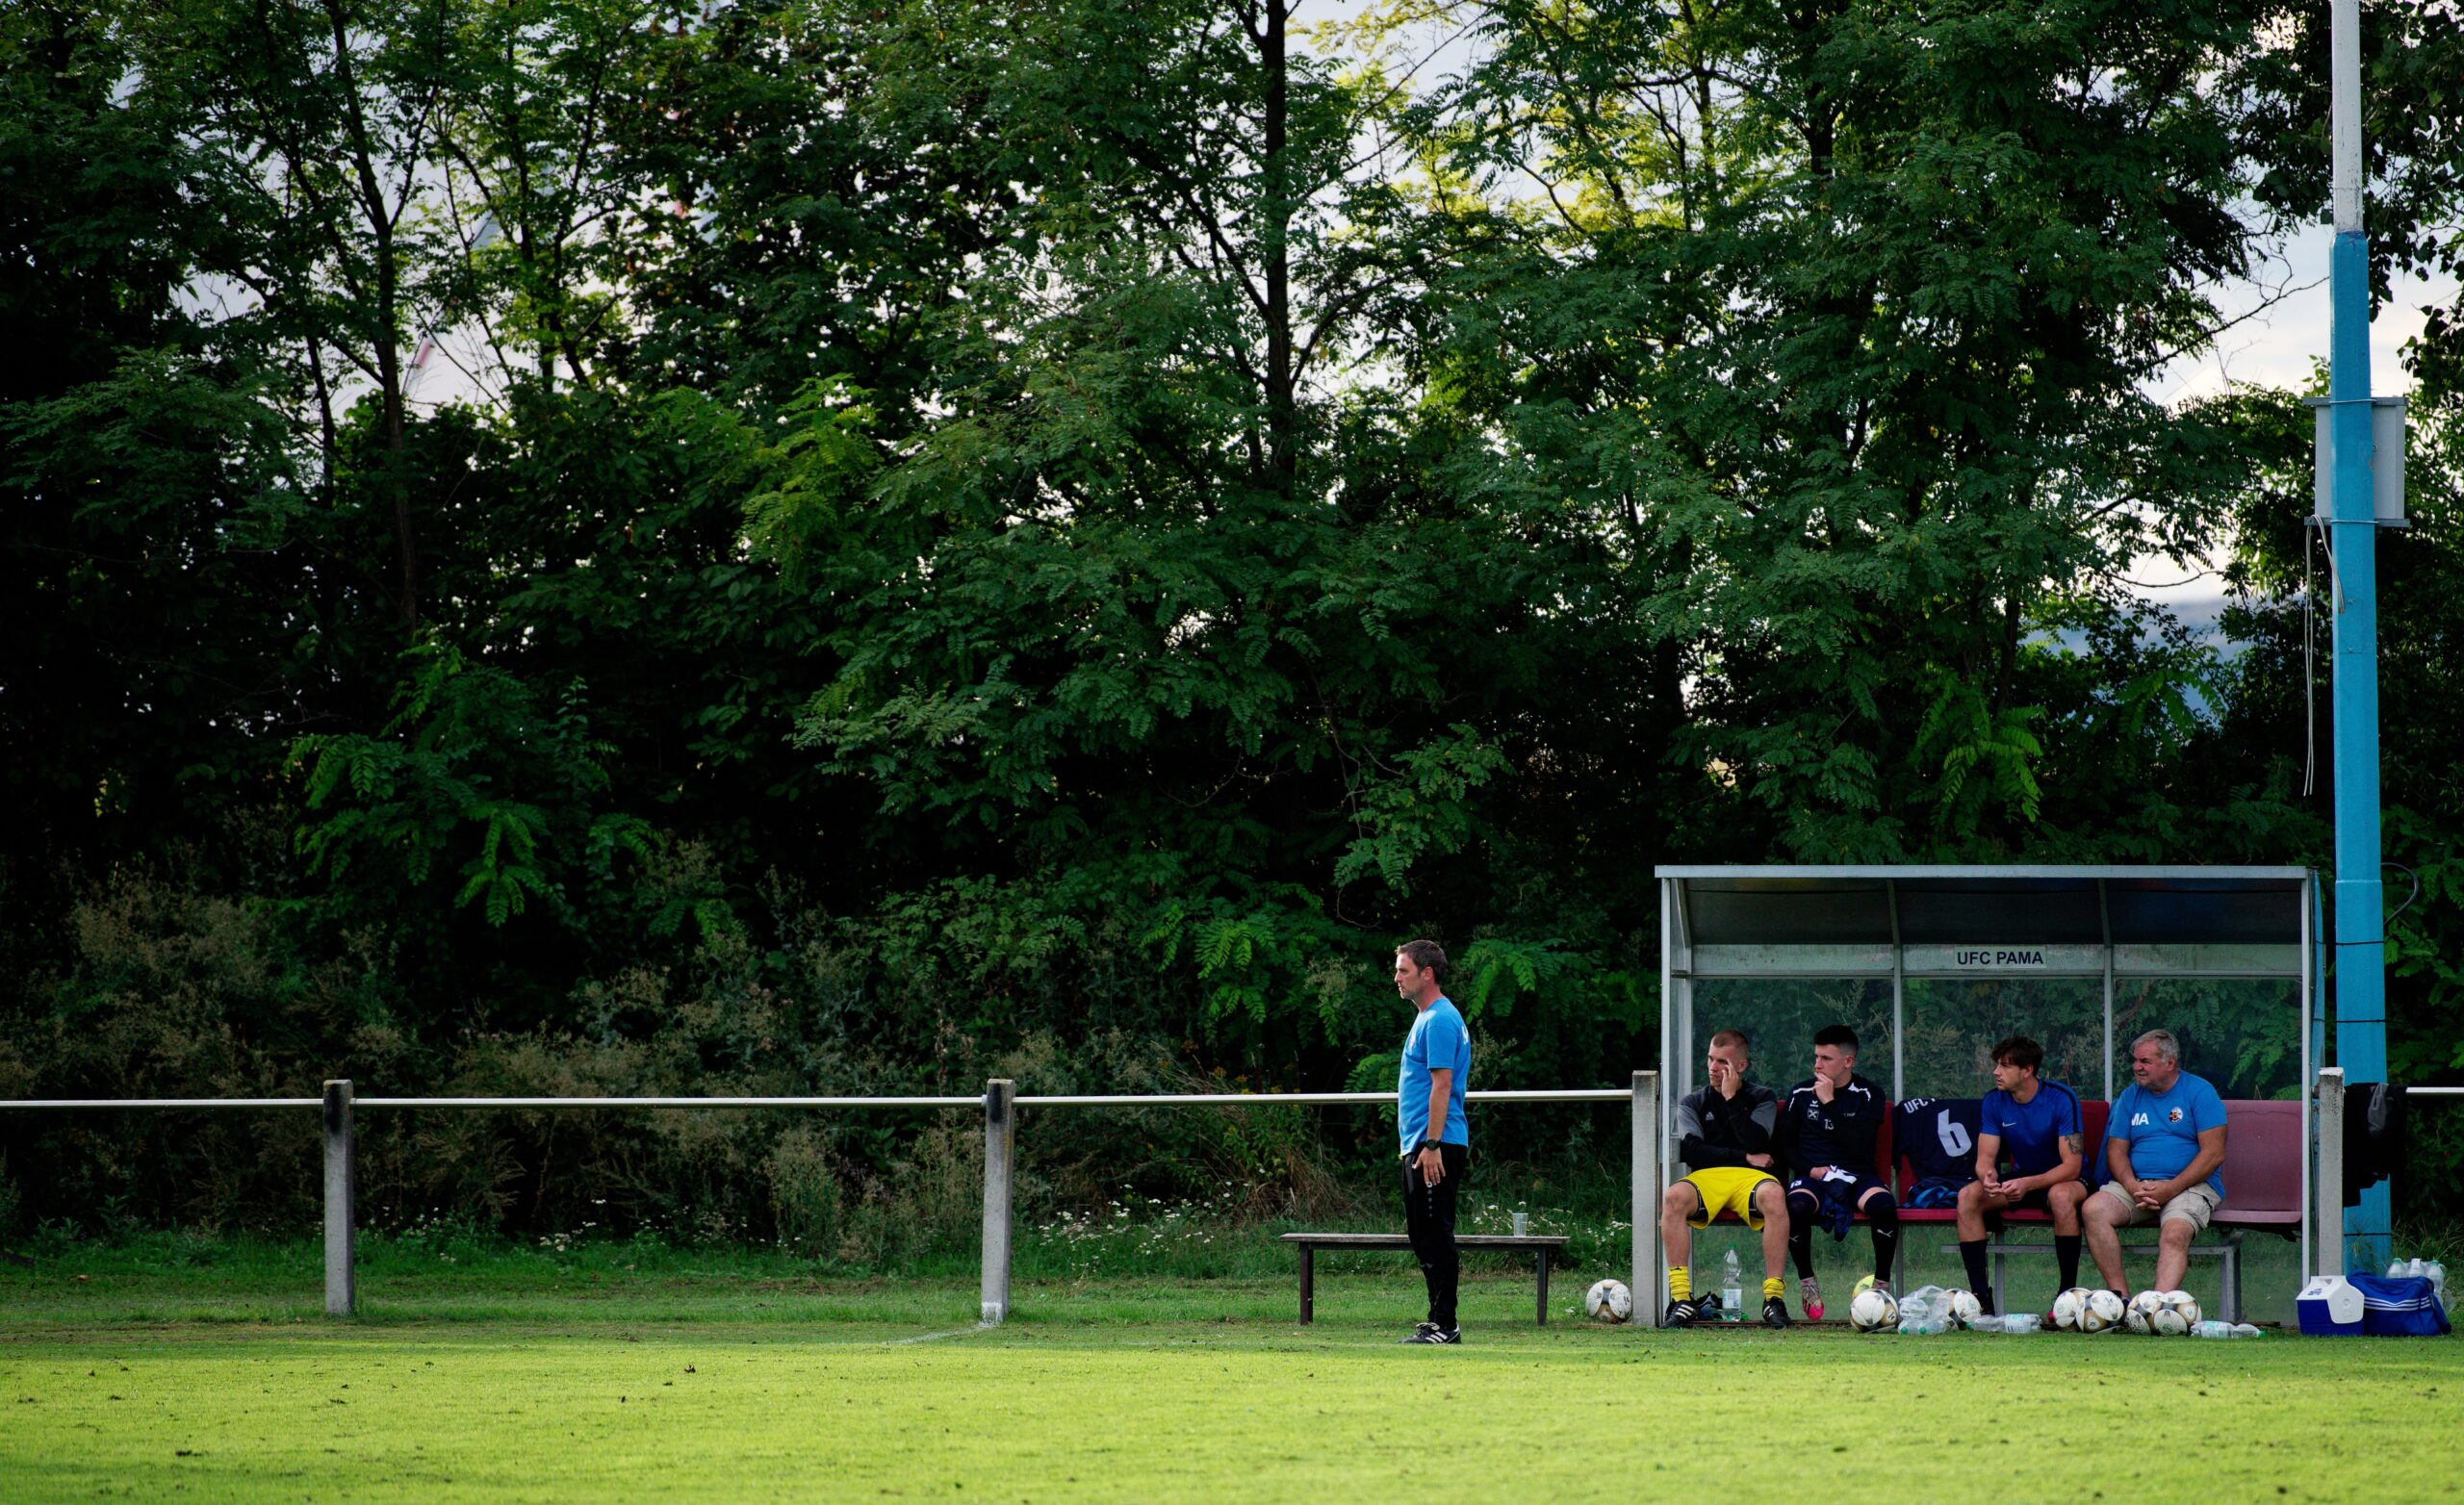 Coach's tension